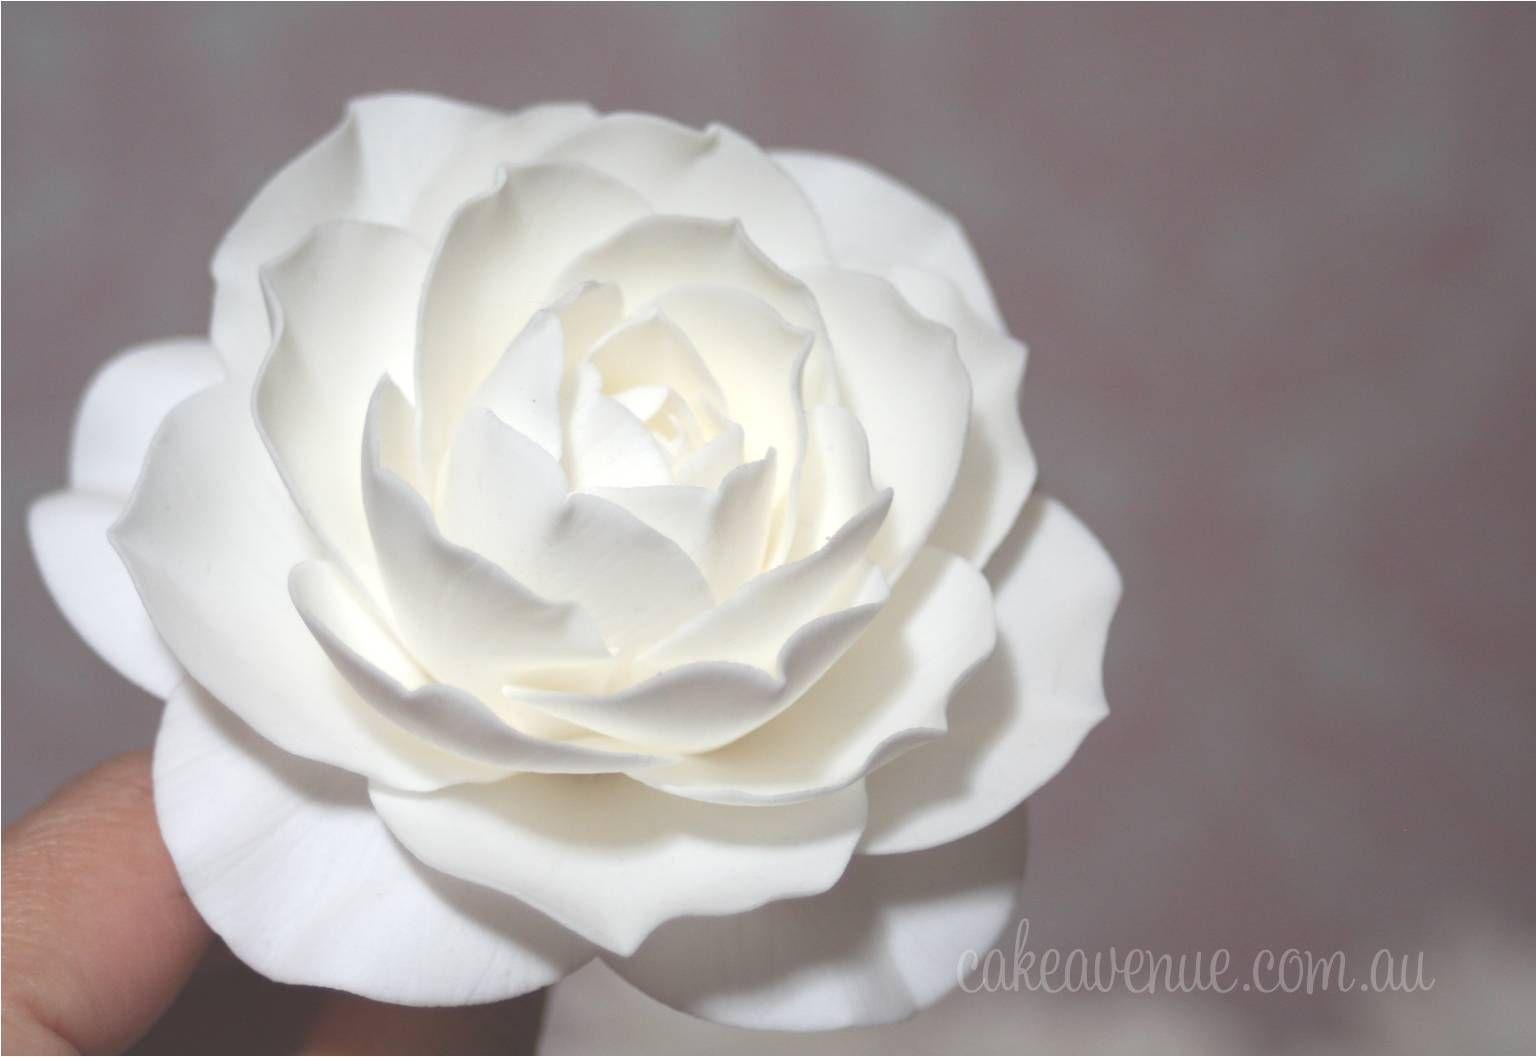 Camellia Sugar Flower Gumpaste Camellia Sugar Flowers Flower Cake Cake Decorating Tutorials